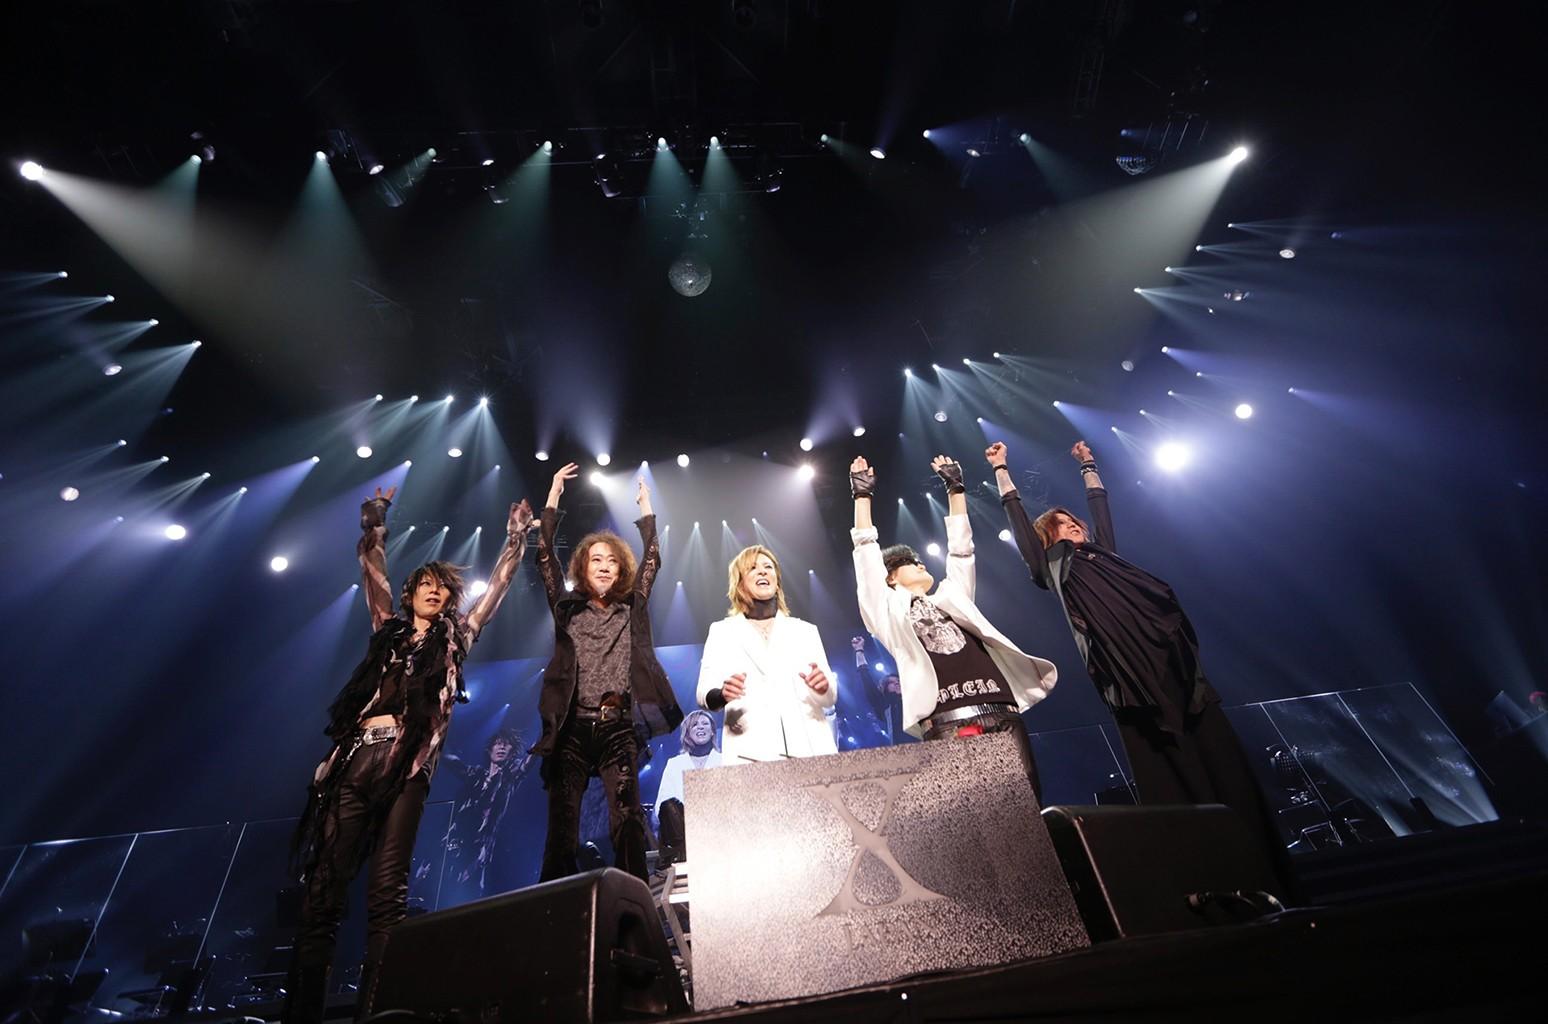 X Japan performs on July 14, 2017 at Yokohama Arena in Japan.